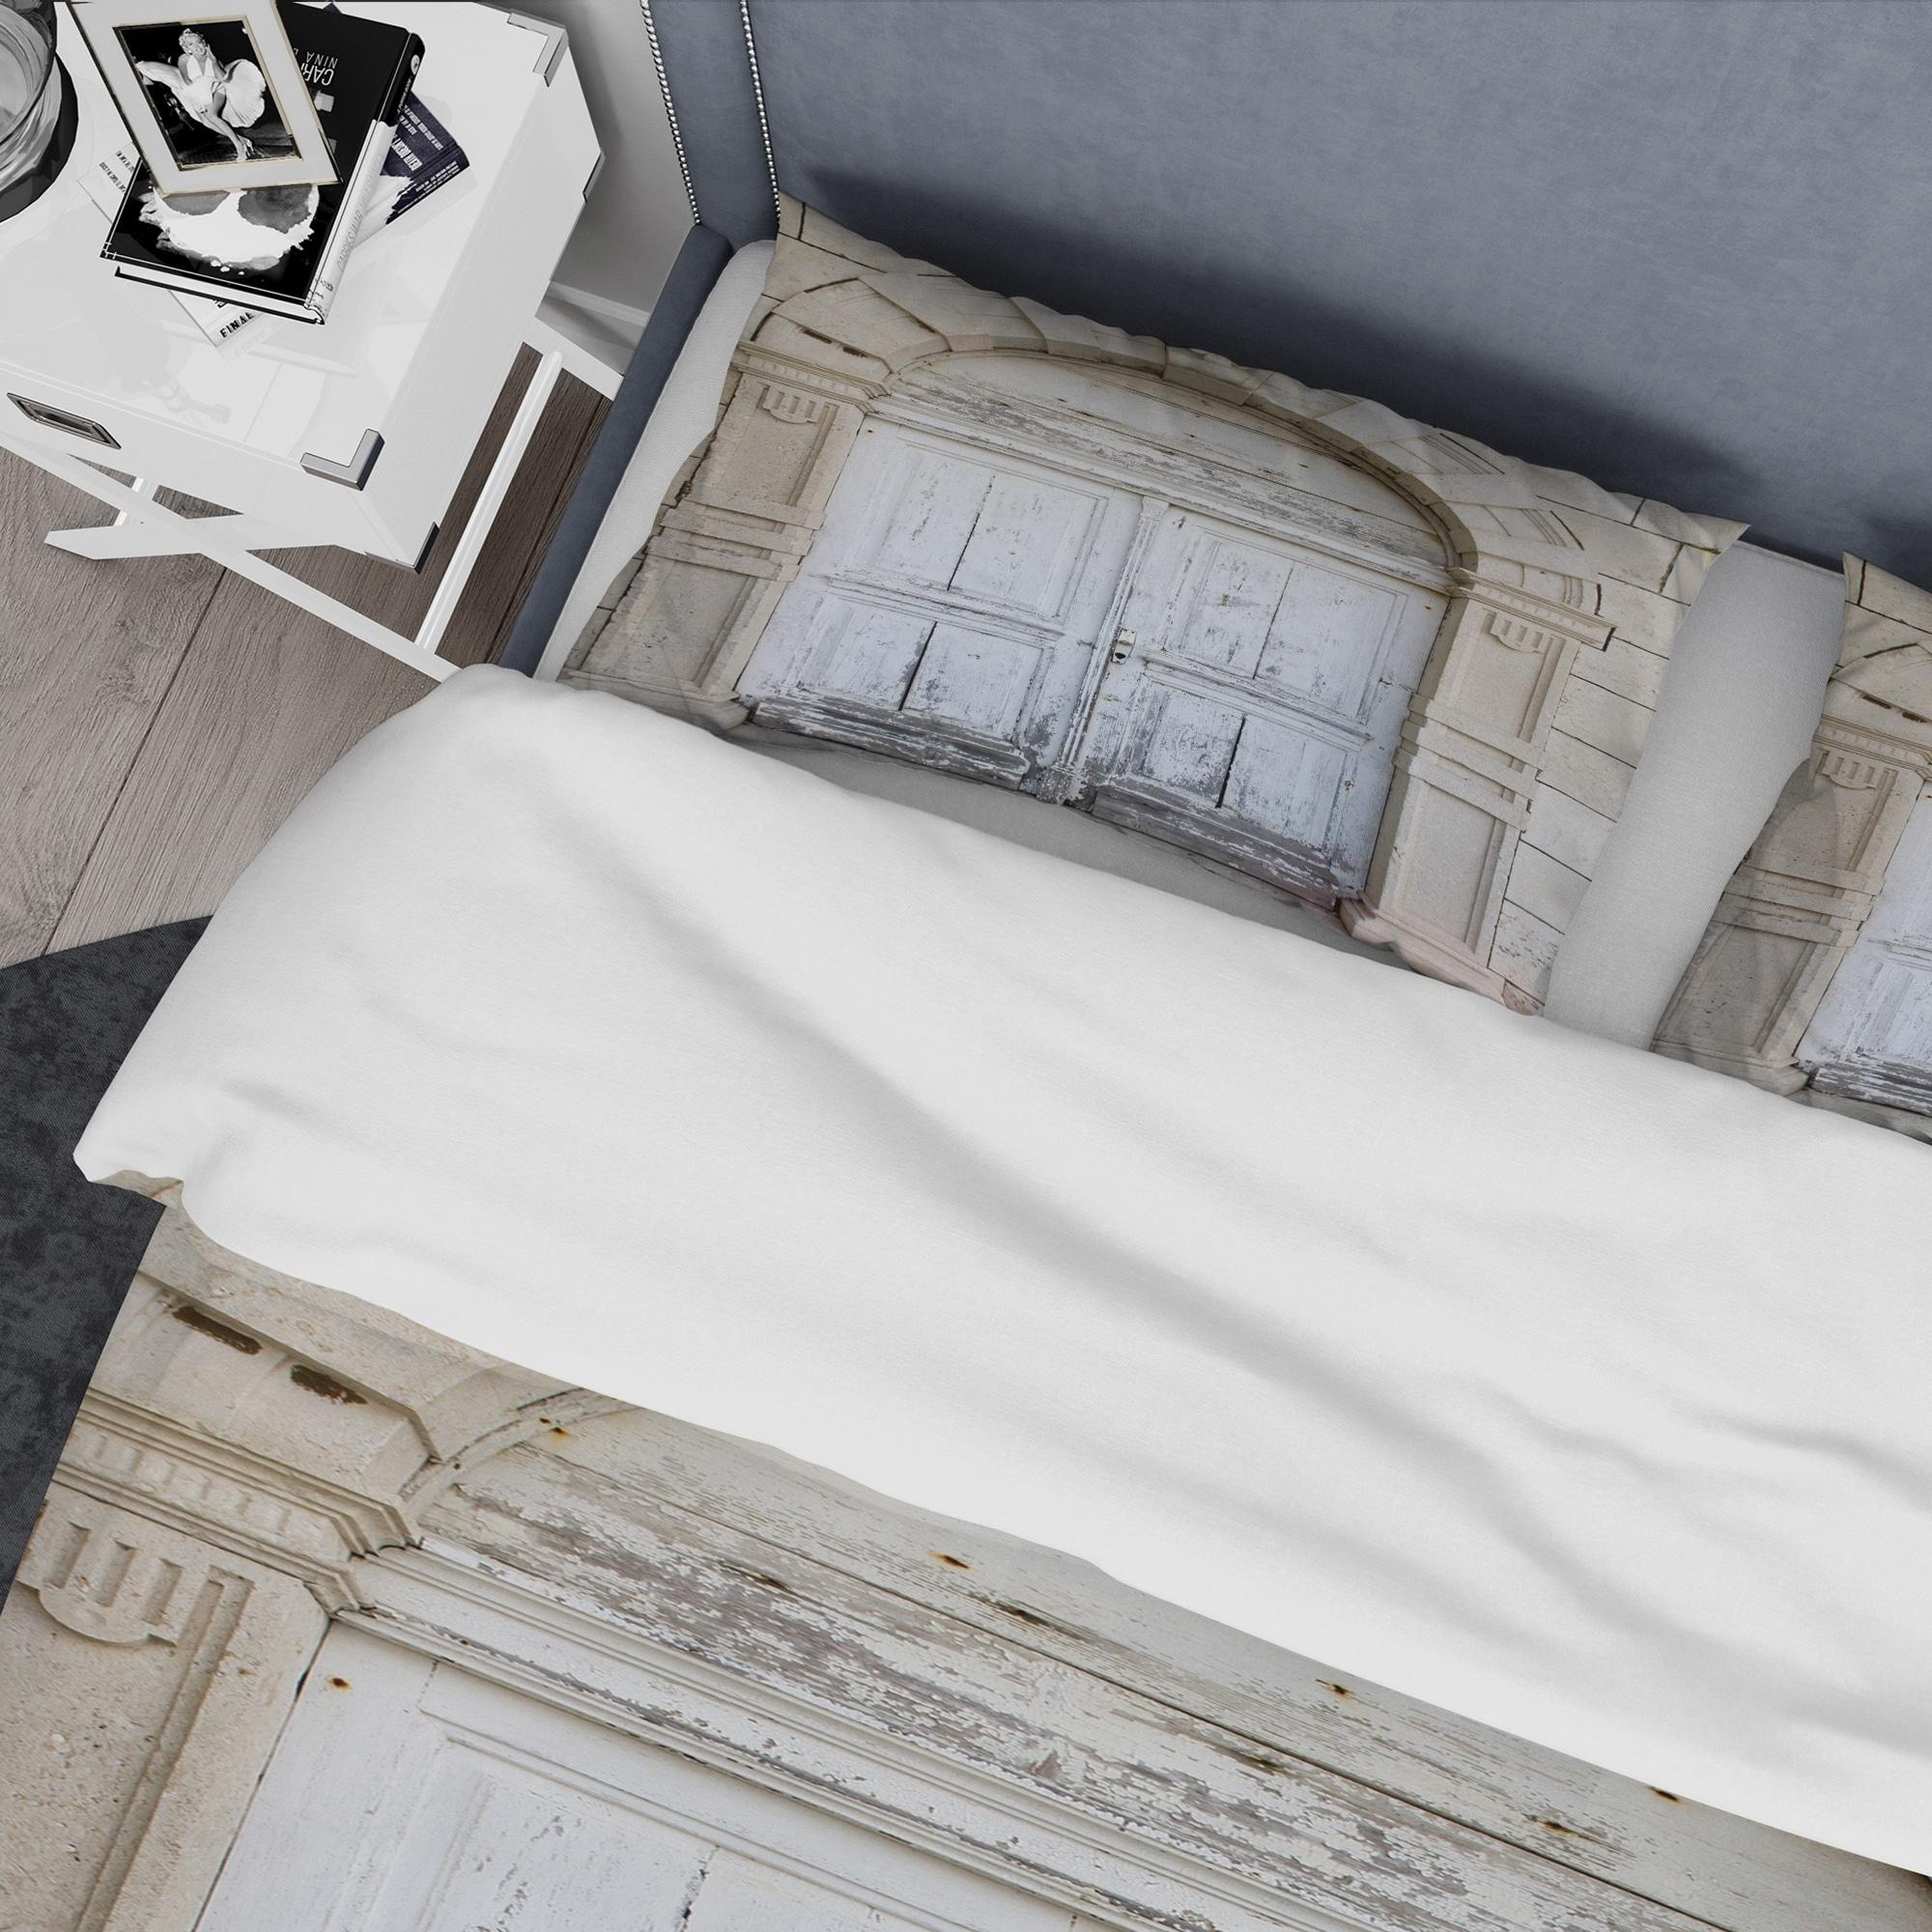 Designart Vintage Italian Door Vintage Bedding Set Duvet Cover Shams Overstock 24240853